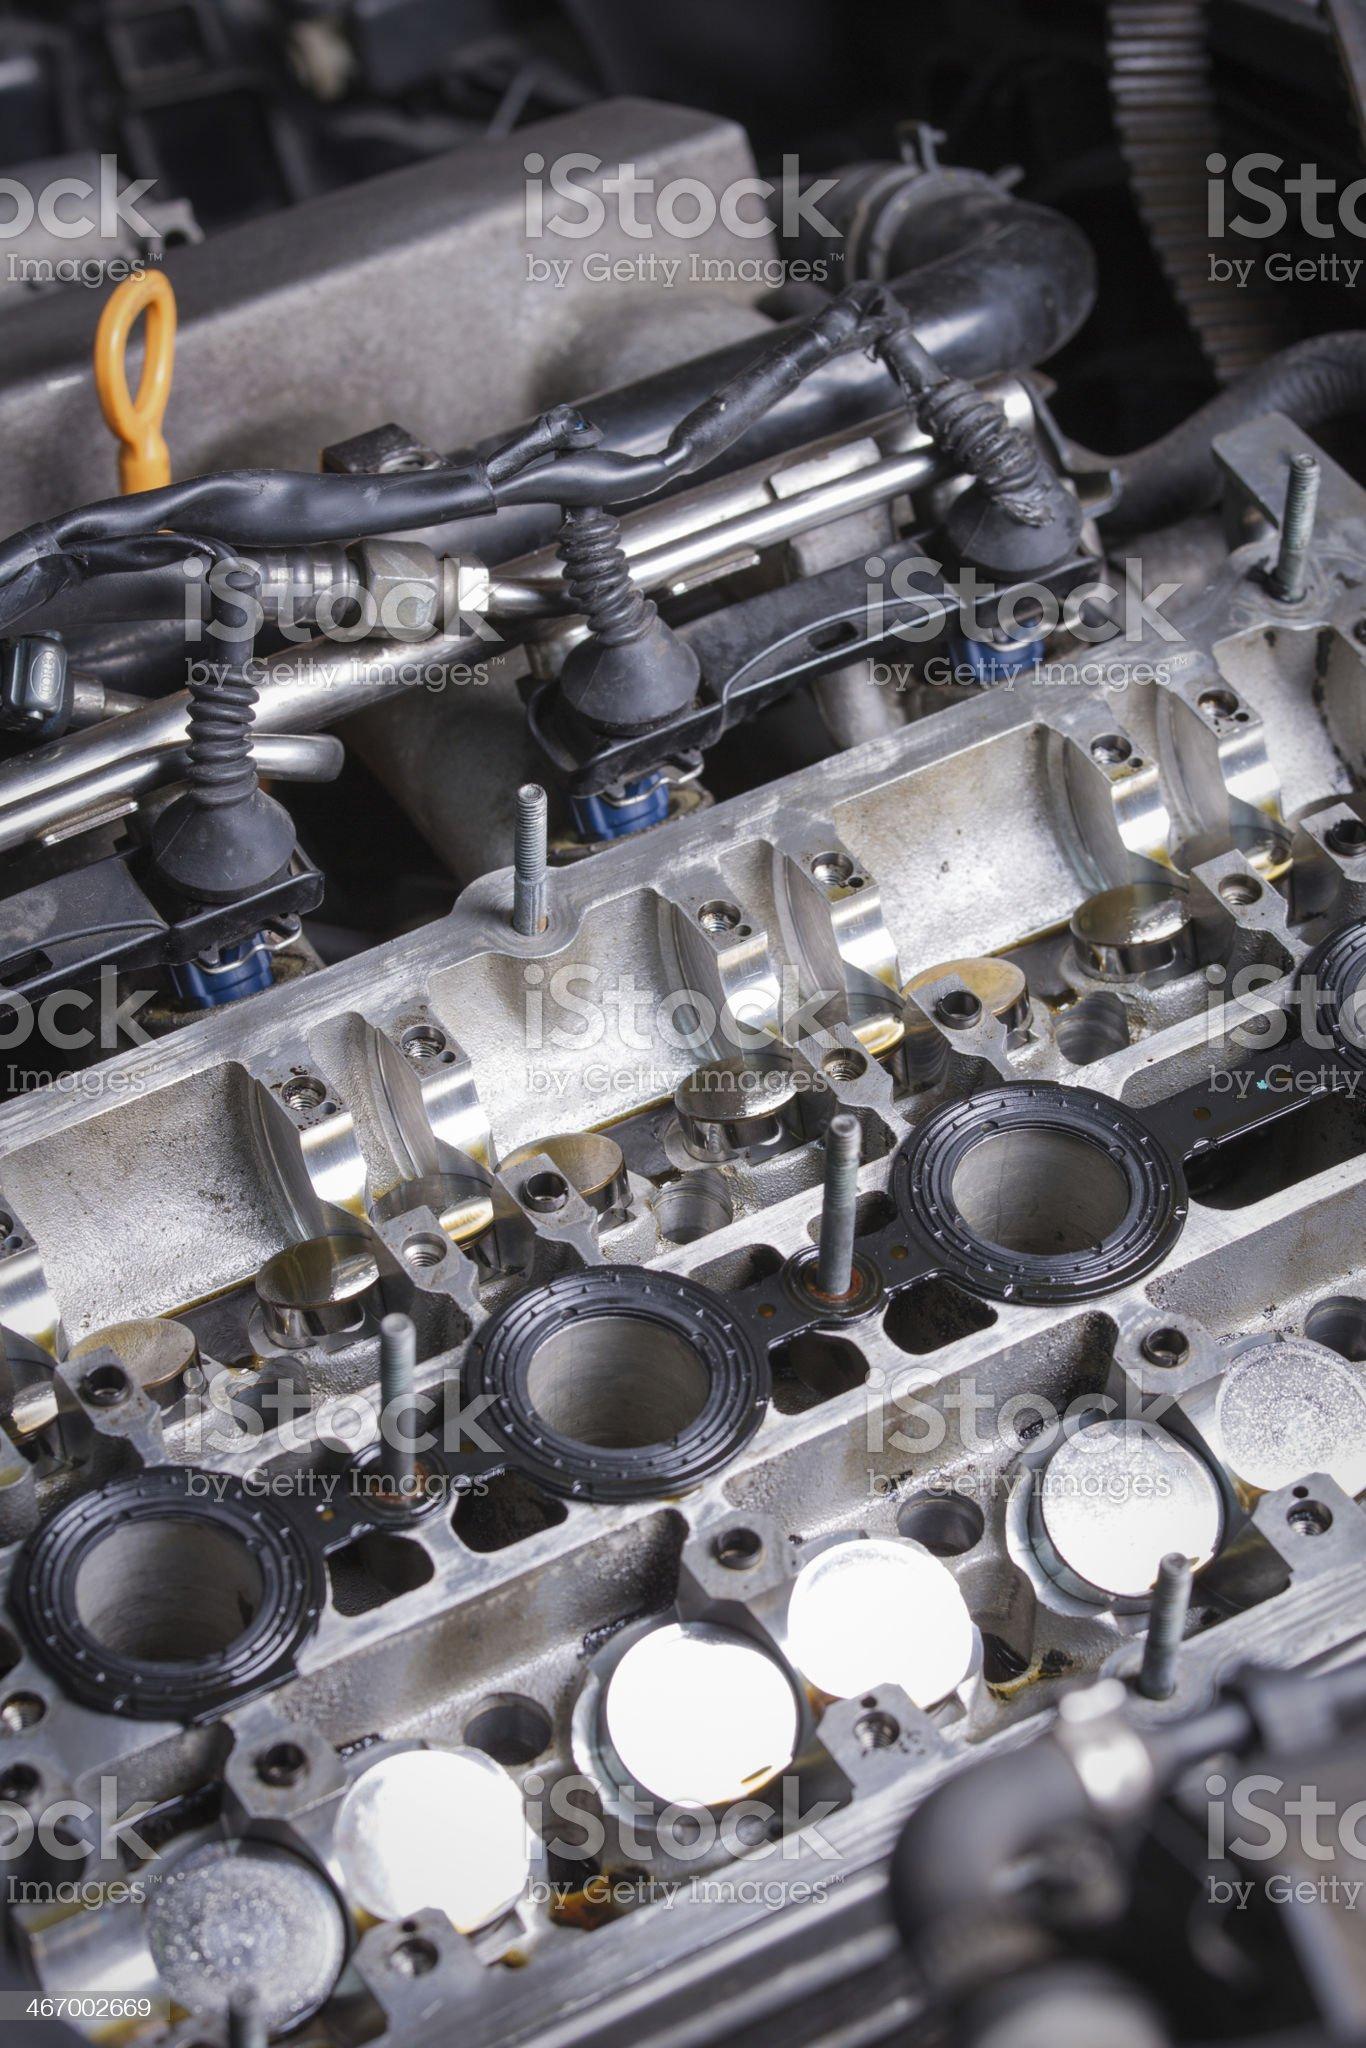 Engine inside royalty-free stock photo